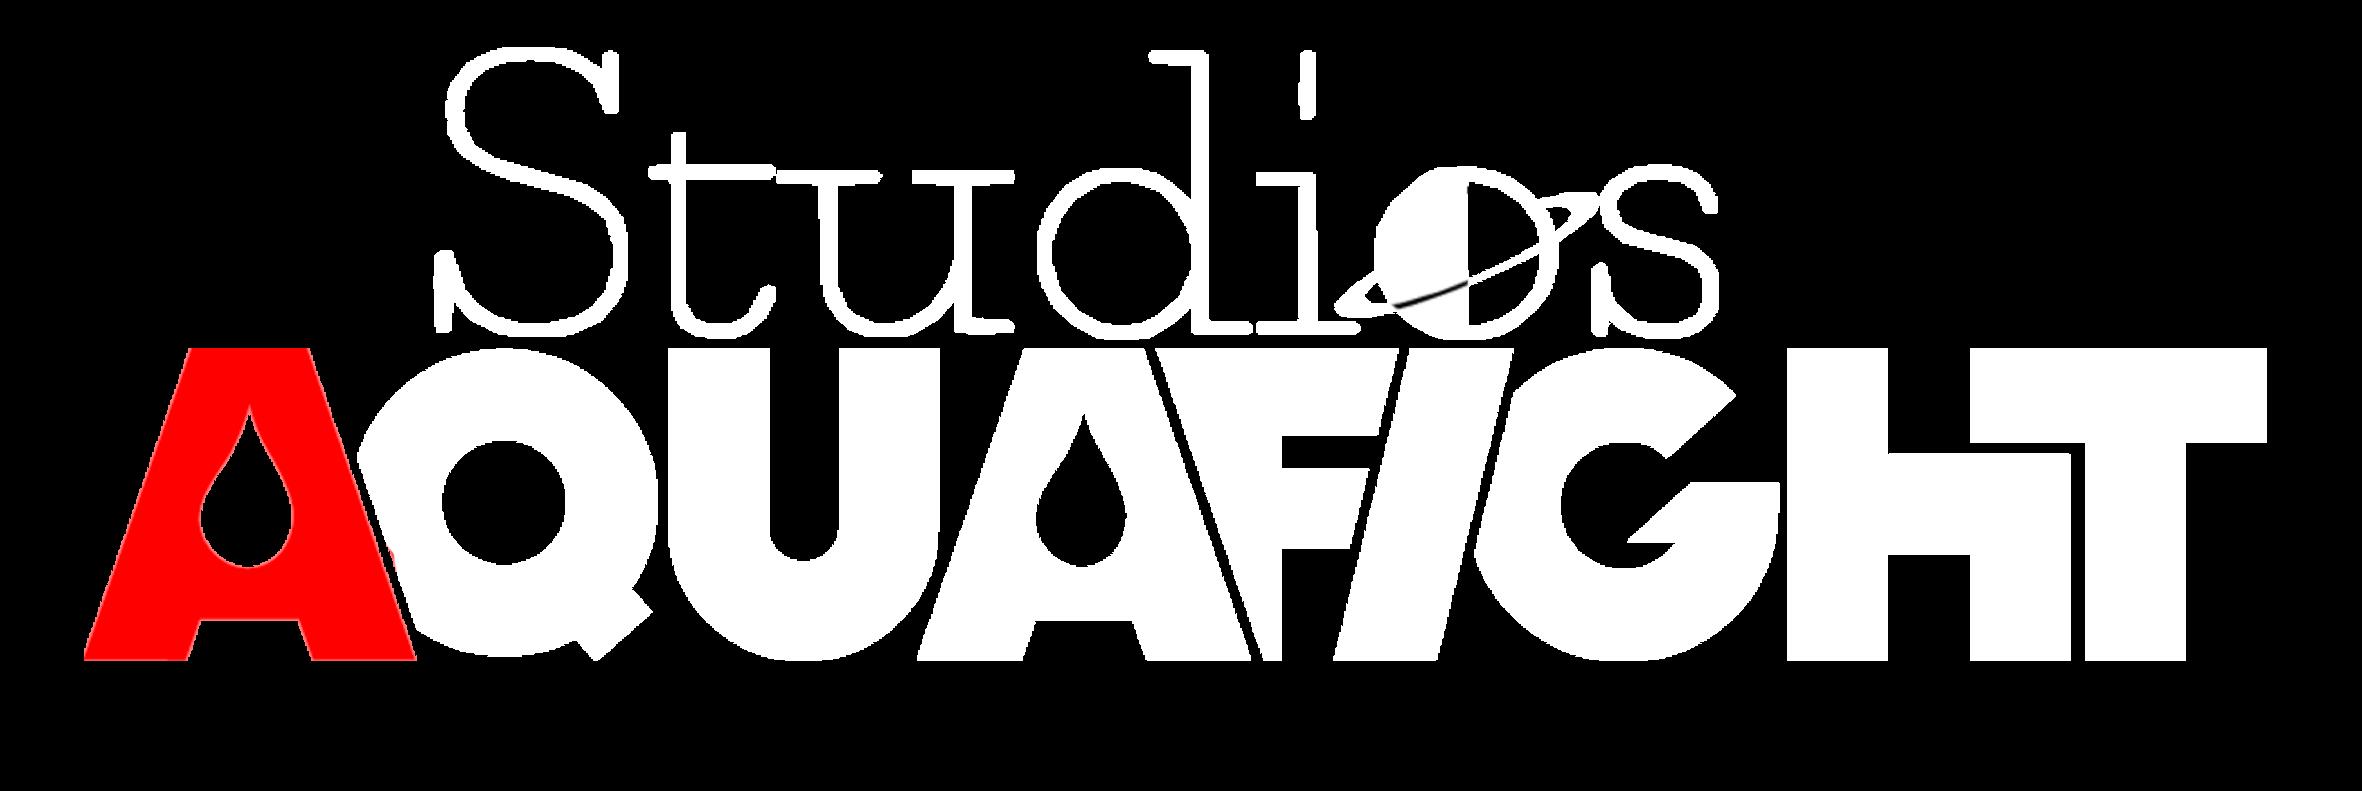 Aquafight Studios